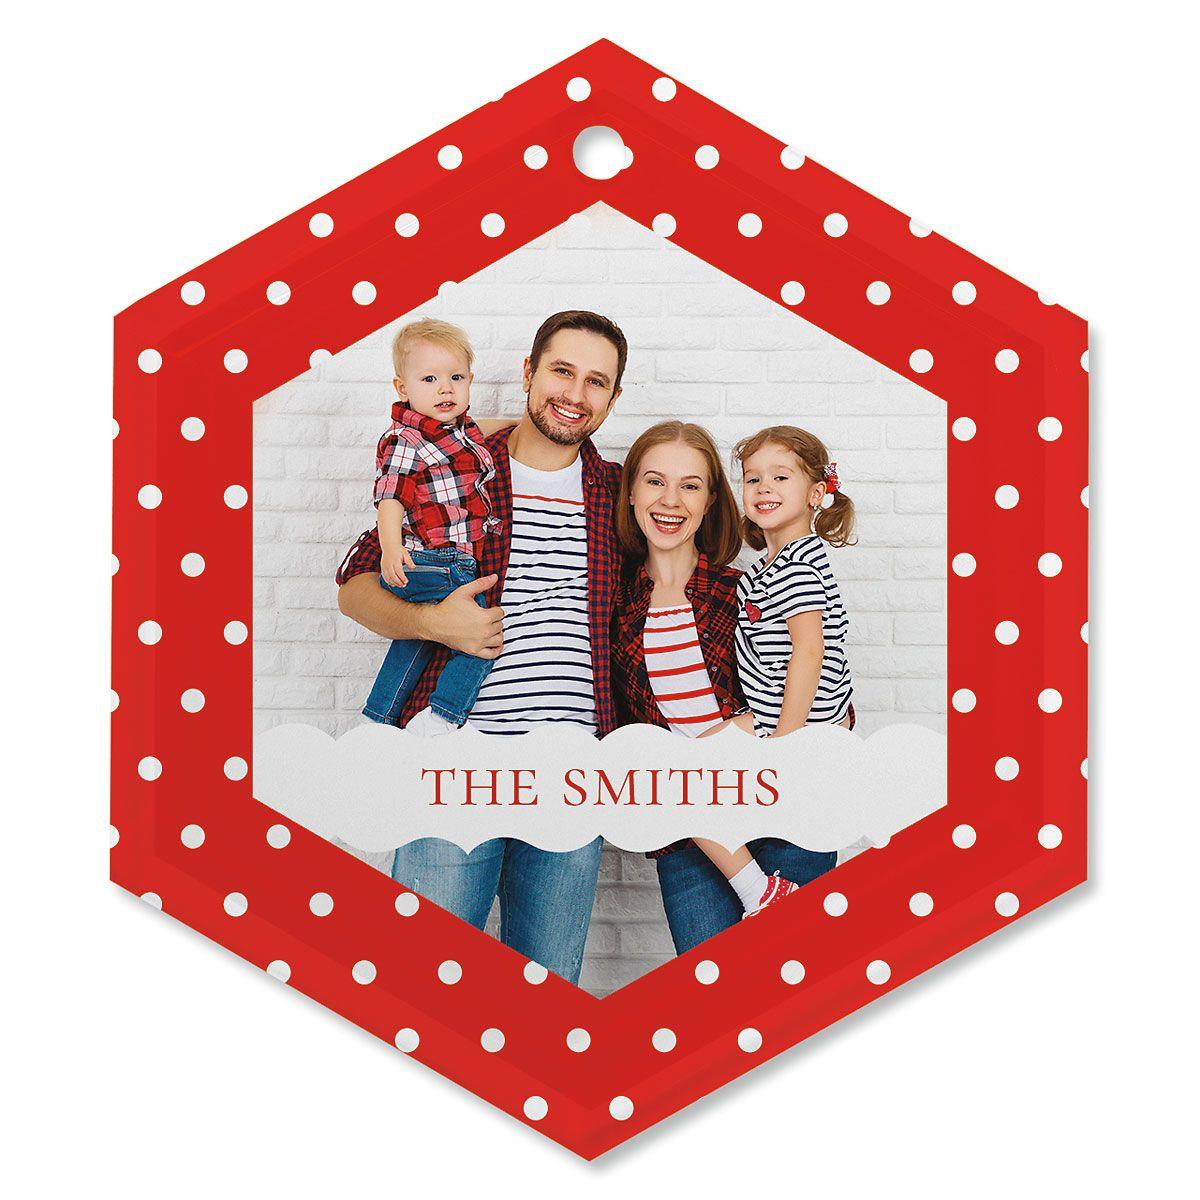 Polka Dot Personalized Photo Ornament - Glass Hexagon